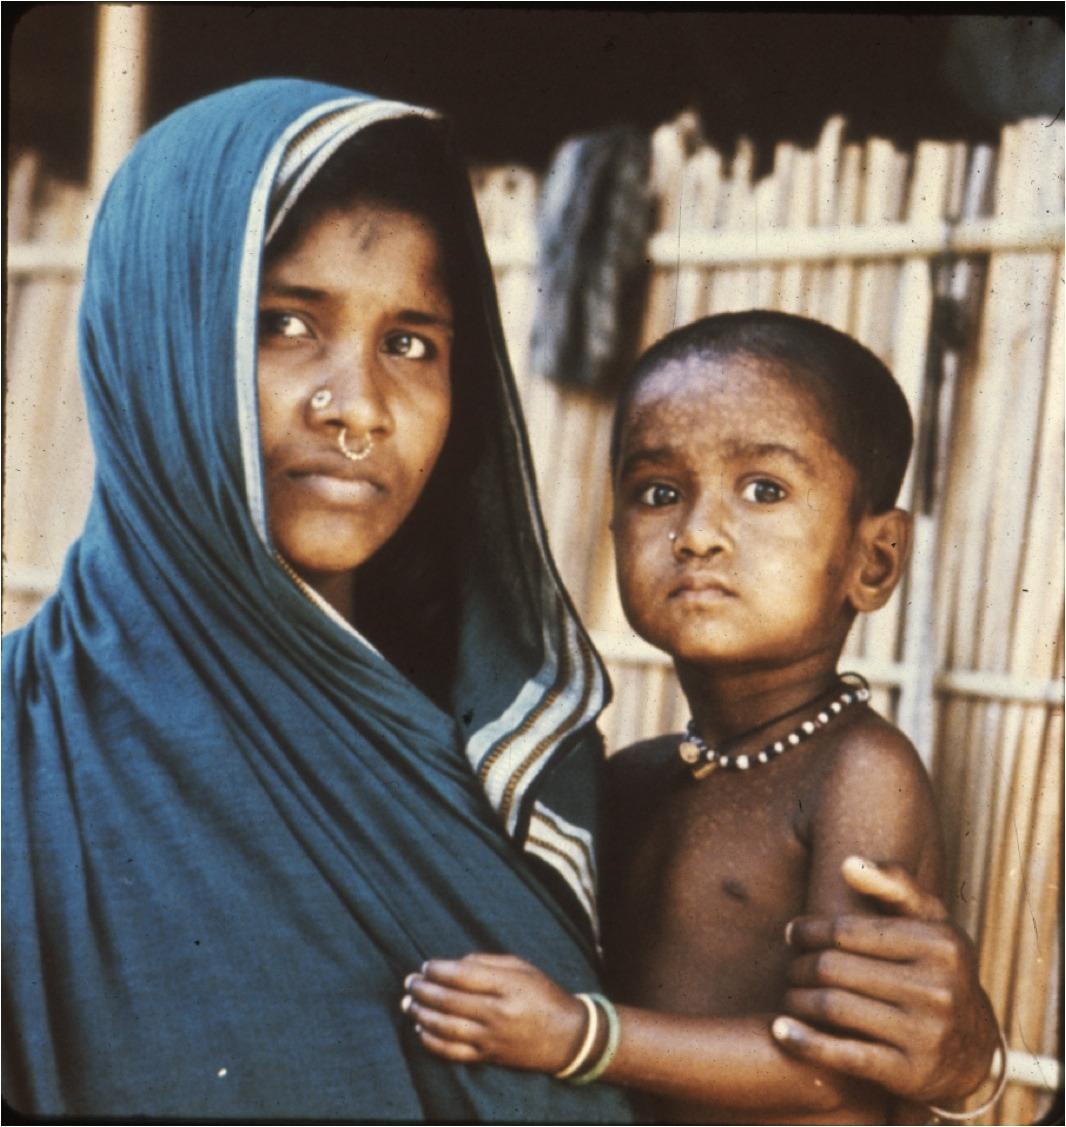 2010-05-18-LastSmallpoxCaseBangladesh1975.jpg